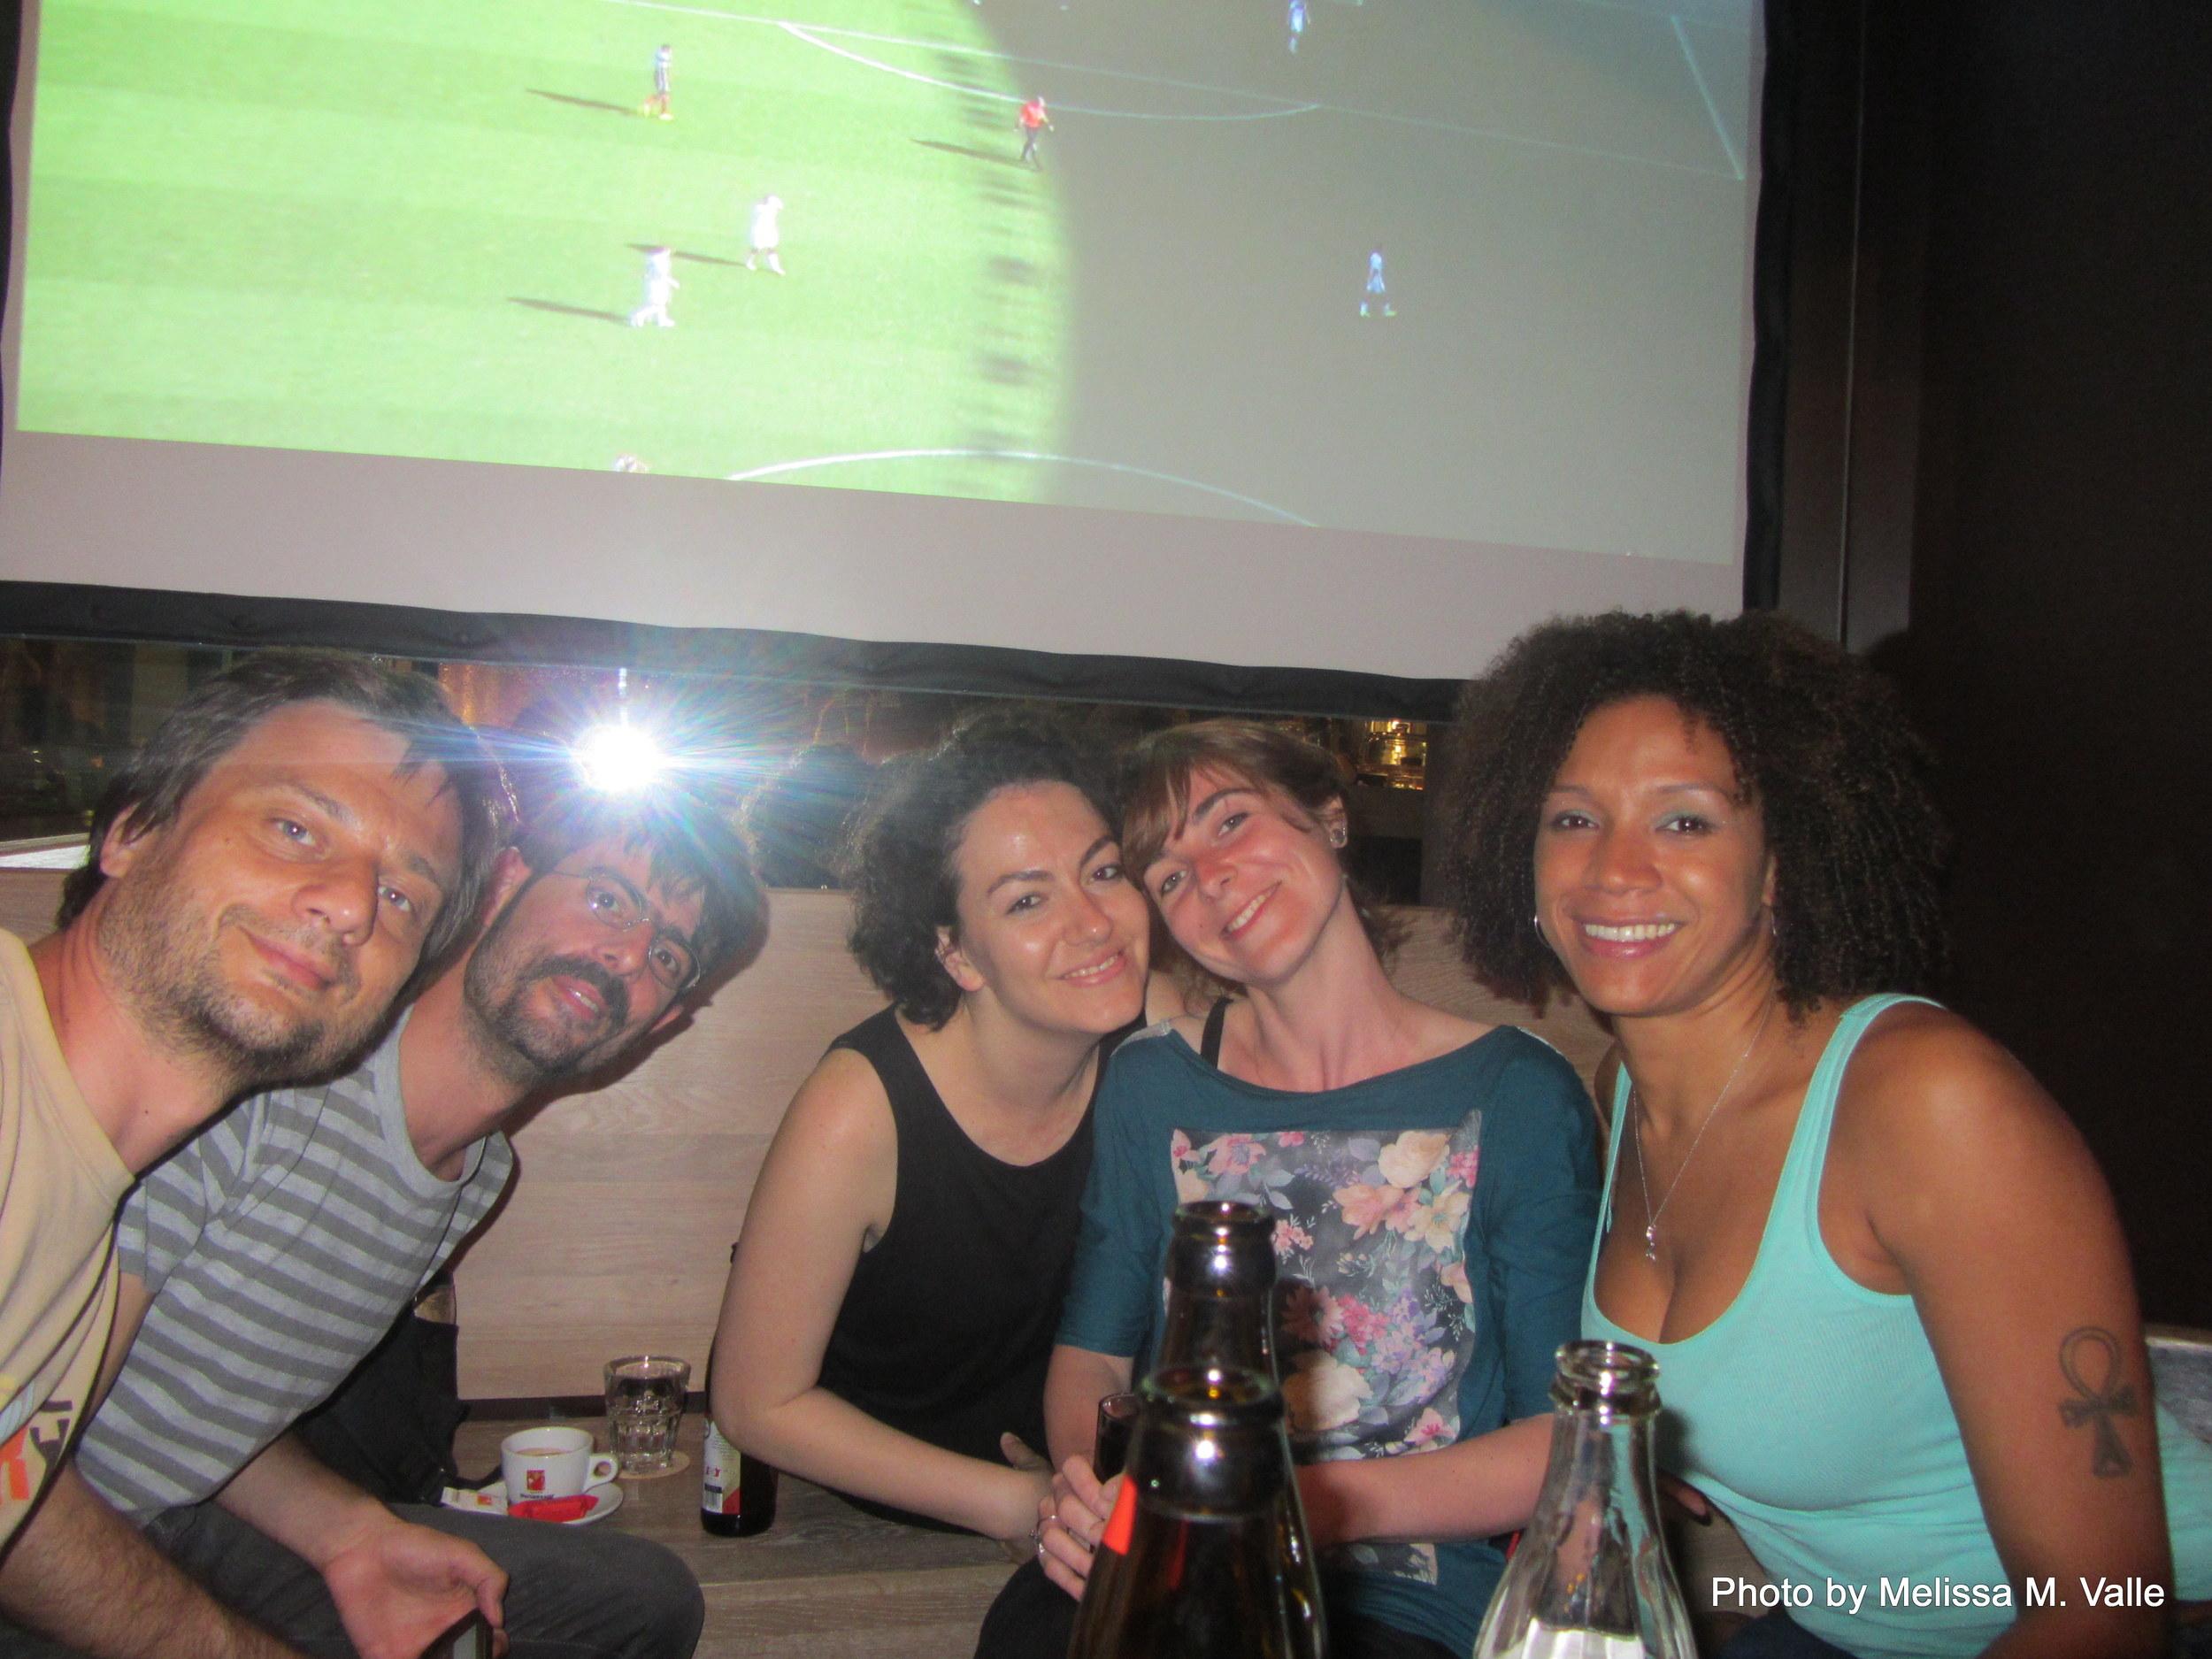 7.8.14 Vienna, Austria-Watching Brasil v Germany world cup match (7).JPG